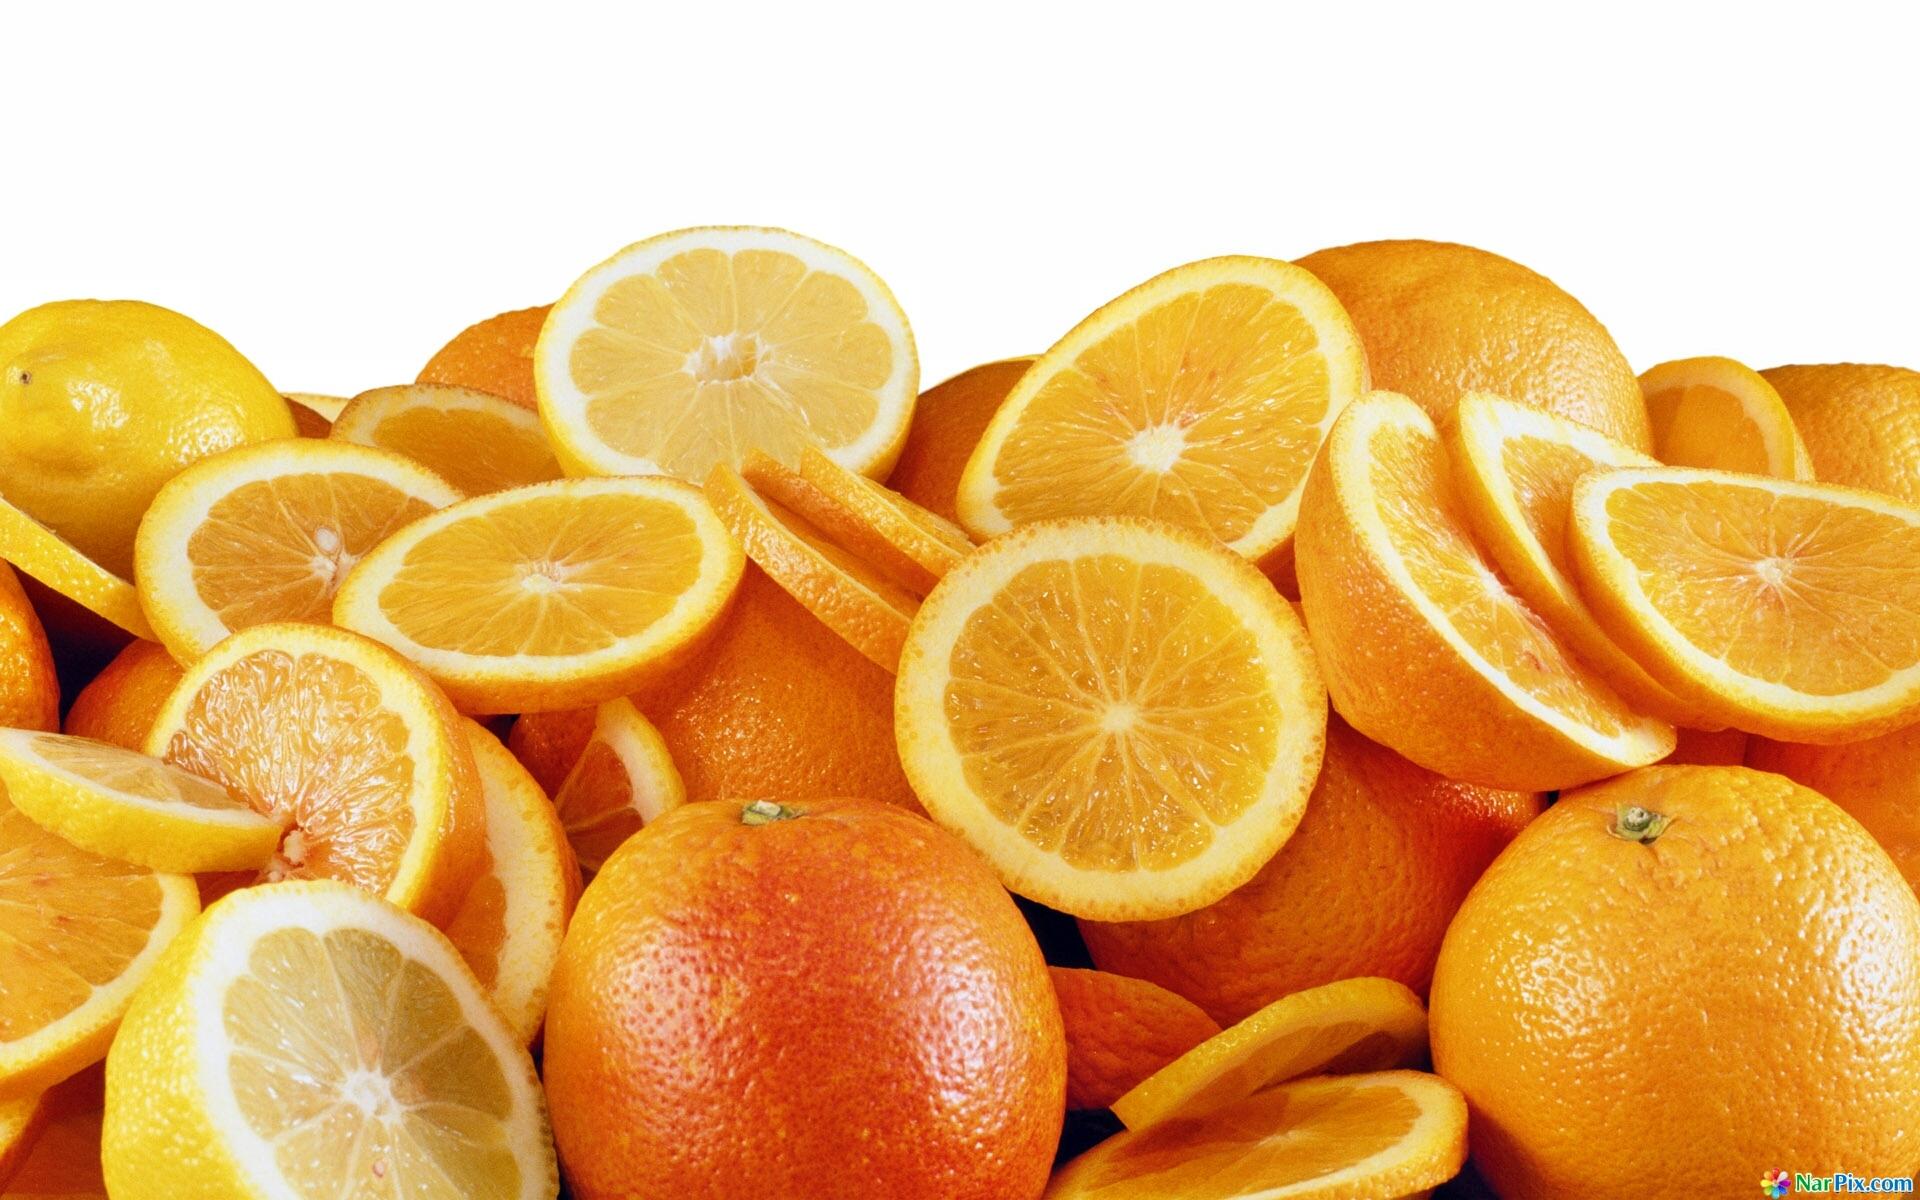 Or orange fruit hd wallpaper - Oranges Wallpapers